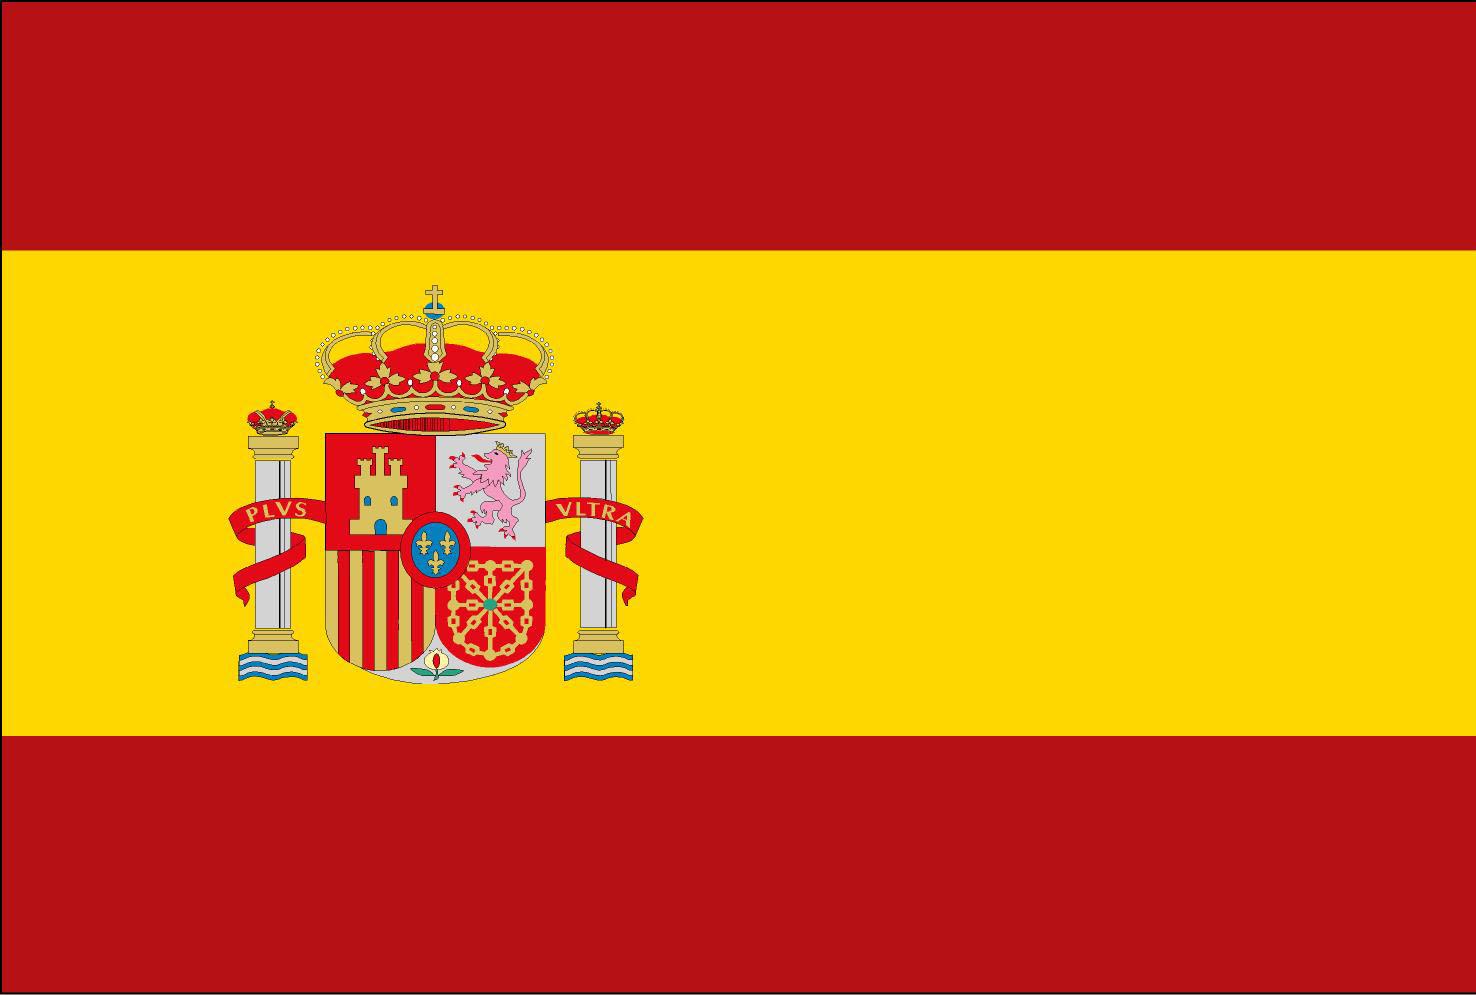 bandeiras da espanha 4